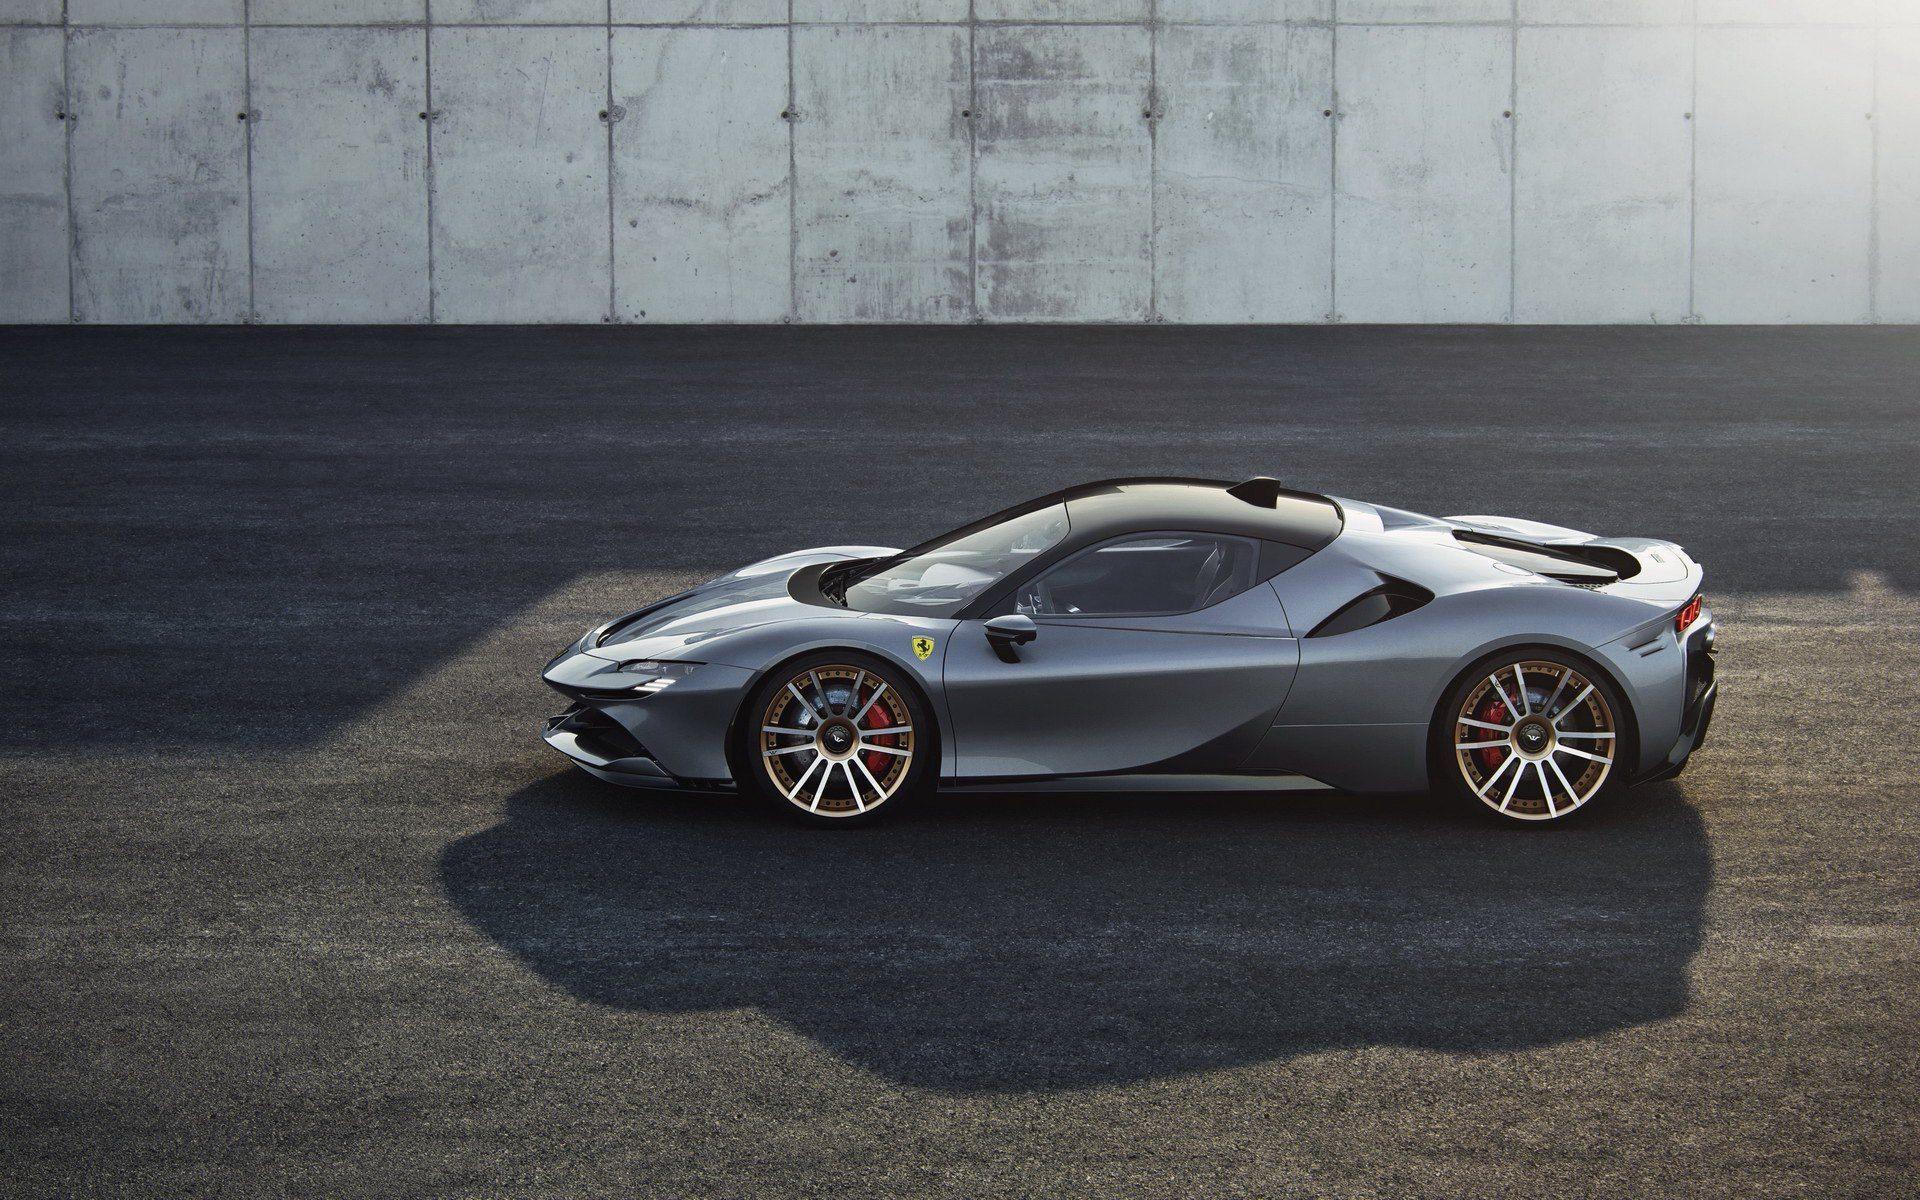 Ferrari_SF90_Stradale_by_Wheelsandmore_0009